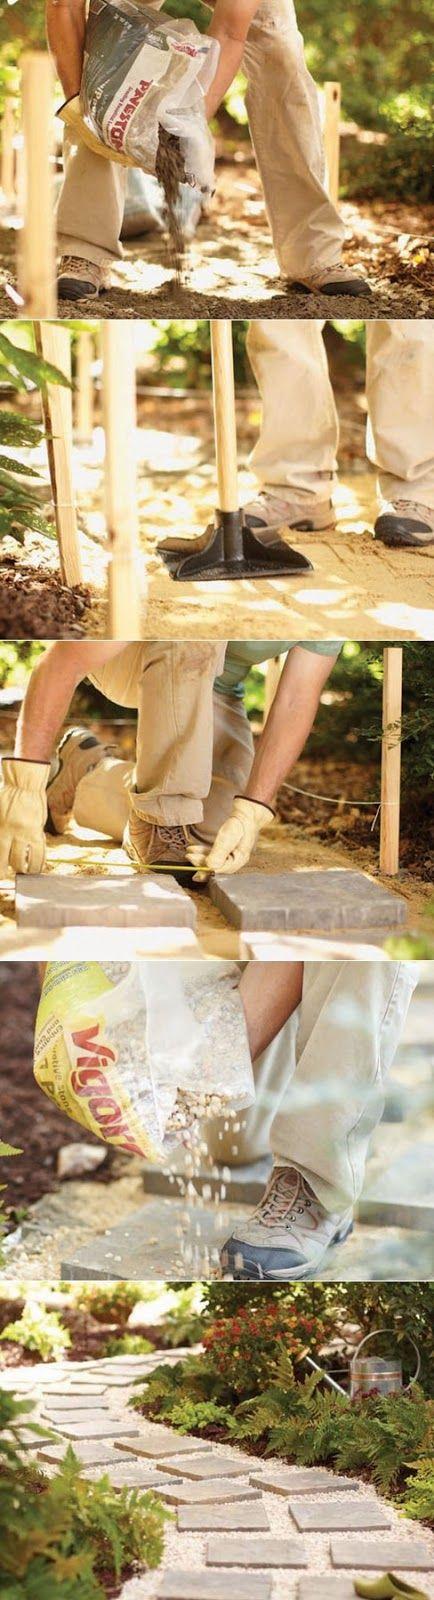 Alternative Gardning: How to build a paver walkway